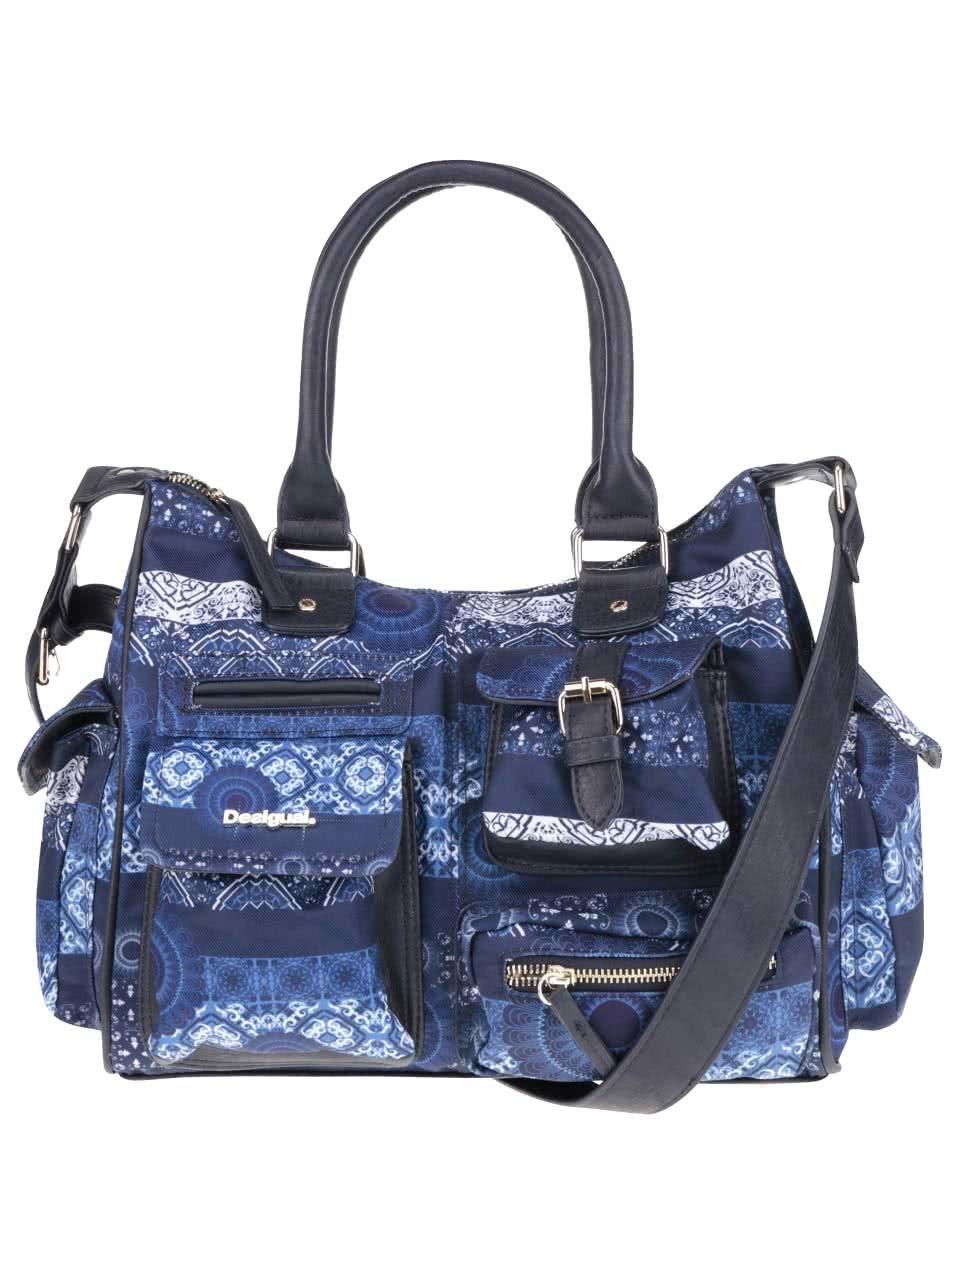 Modrá vzorovaná kabelka Desigual London Barbados